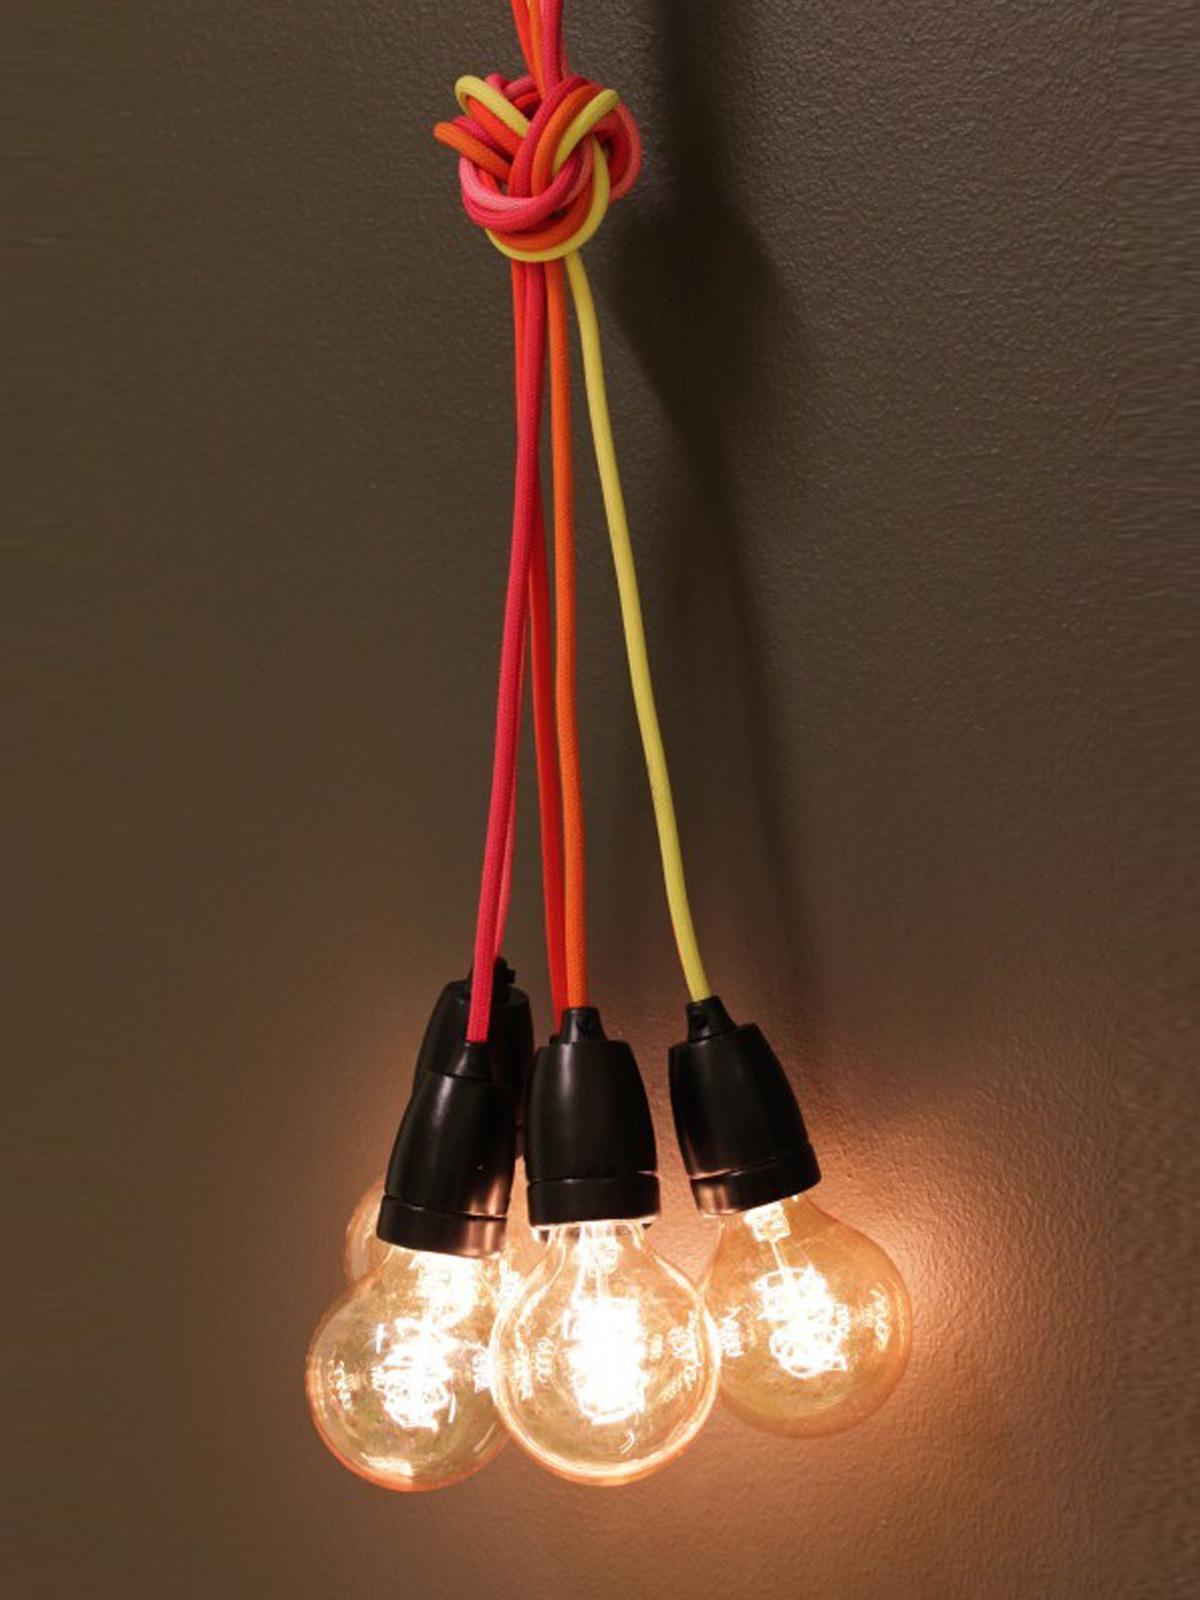 nud classic gelb lampen leuchten designerleuchten online berlin design. Black Bedroom Furniture Sets. Home Design Ideas